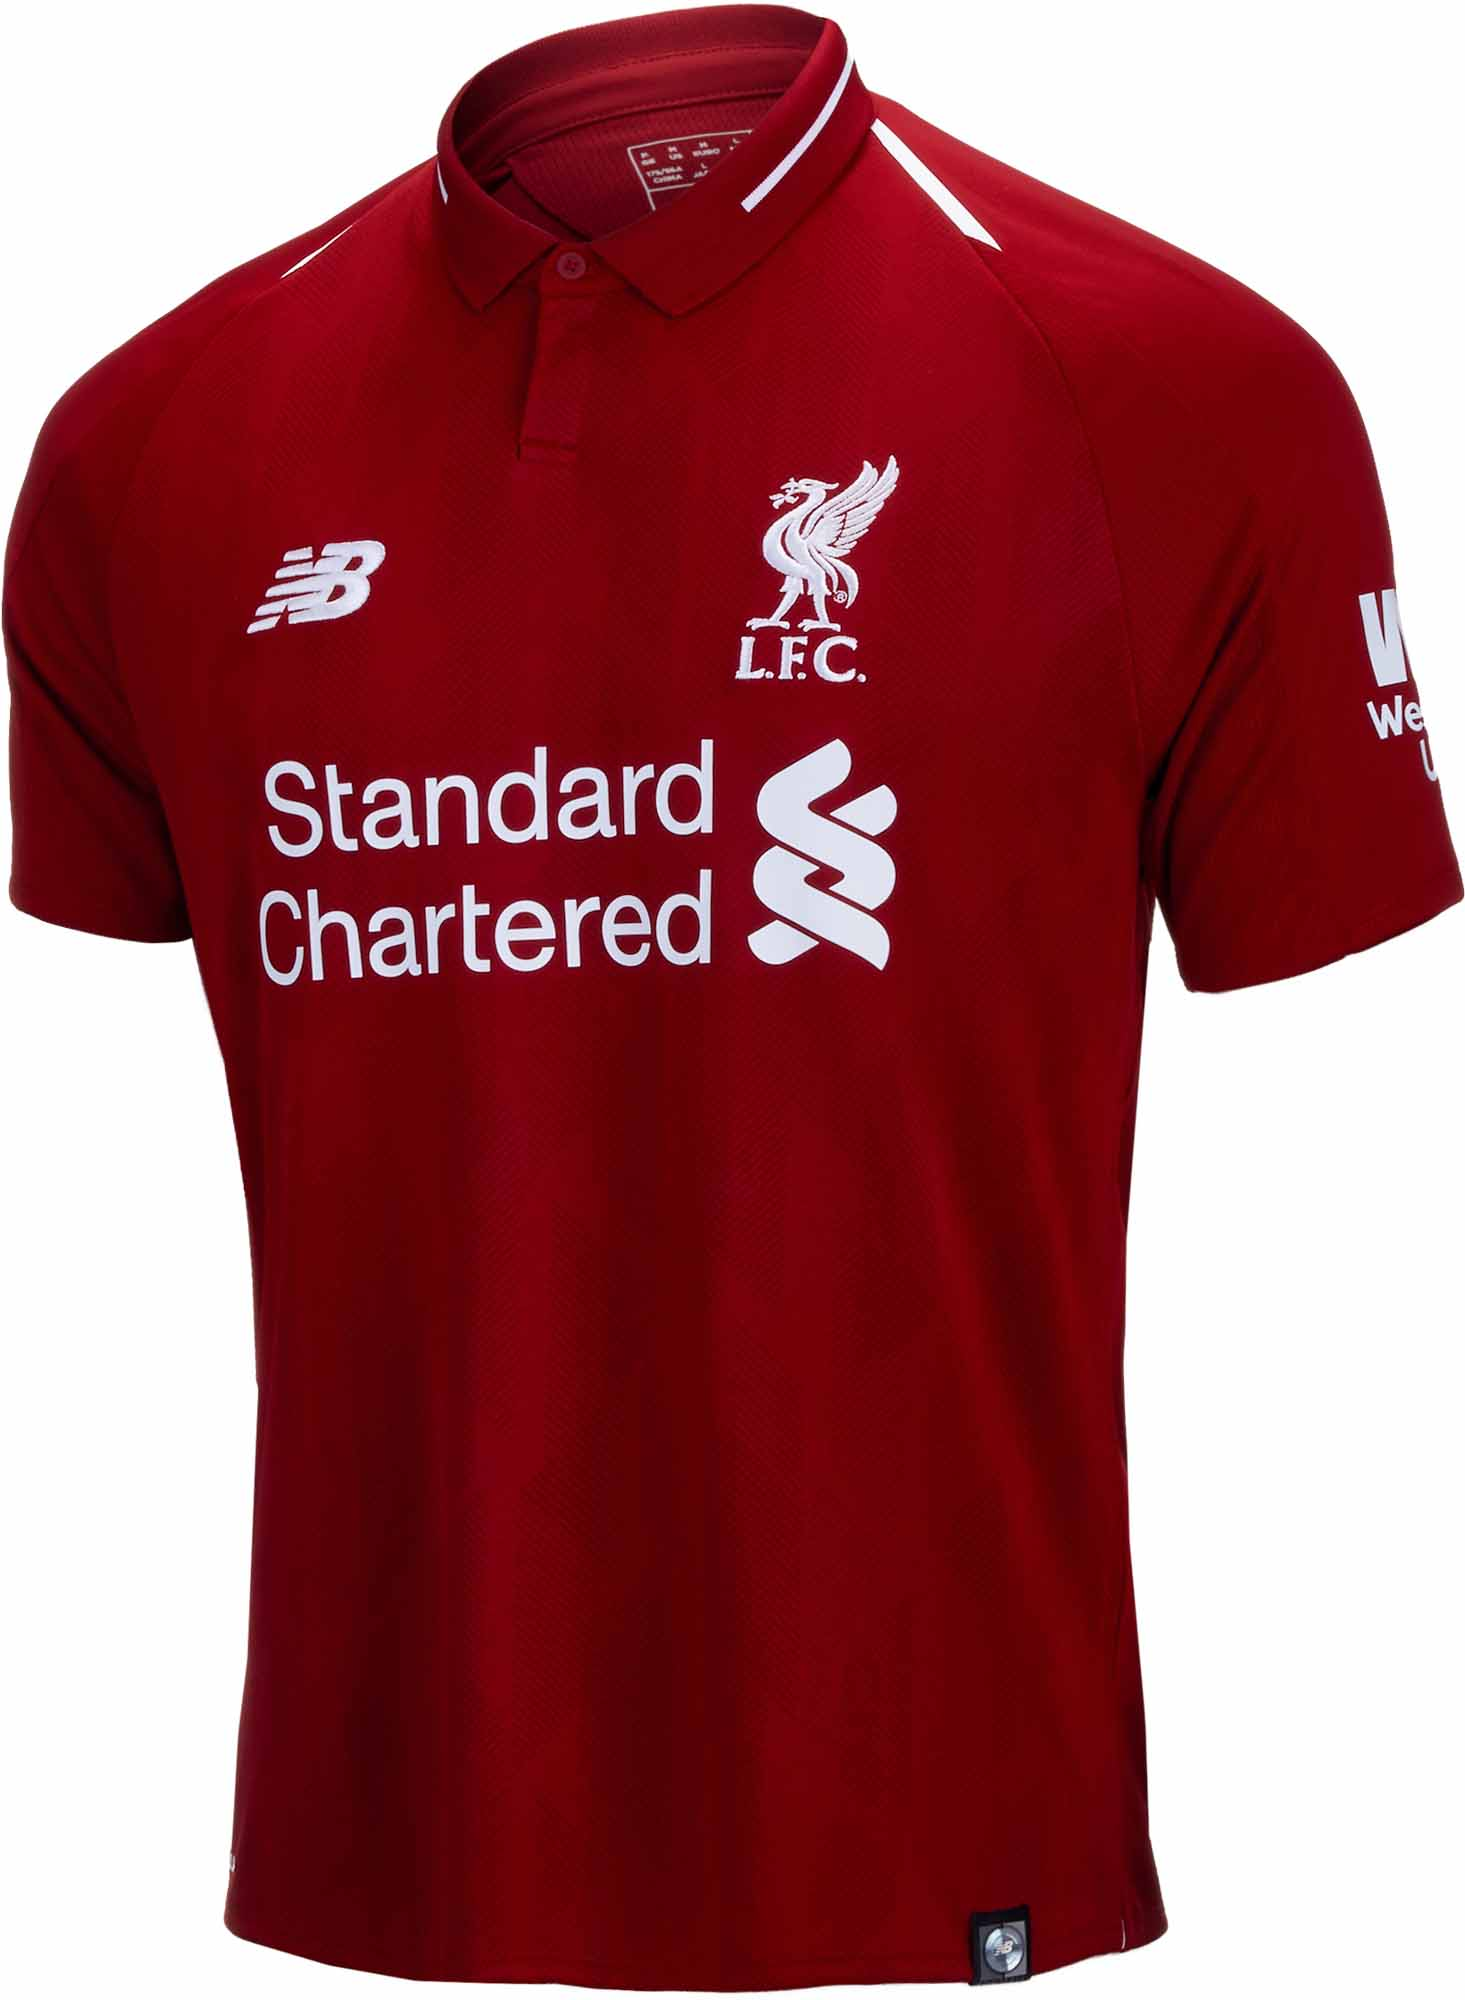 84571fdb3 2018 19 Kids New Balance Liverpool Home Jersey - SoccerPro